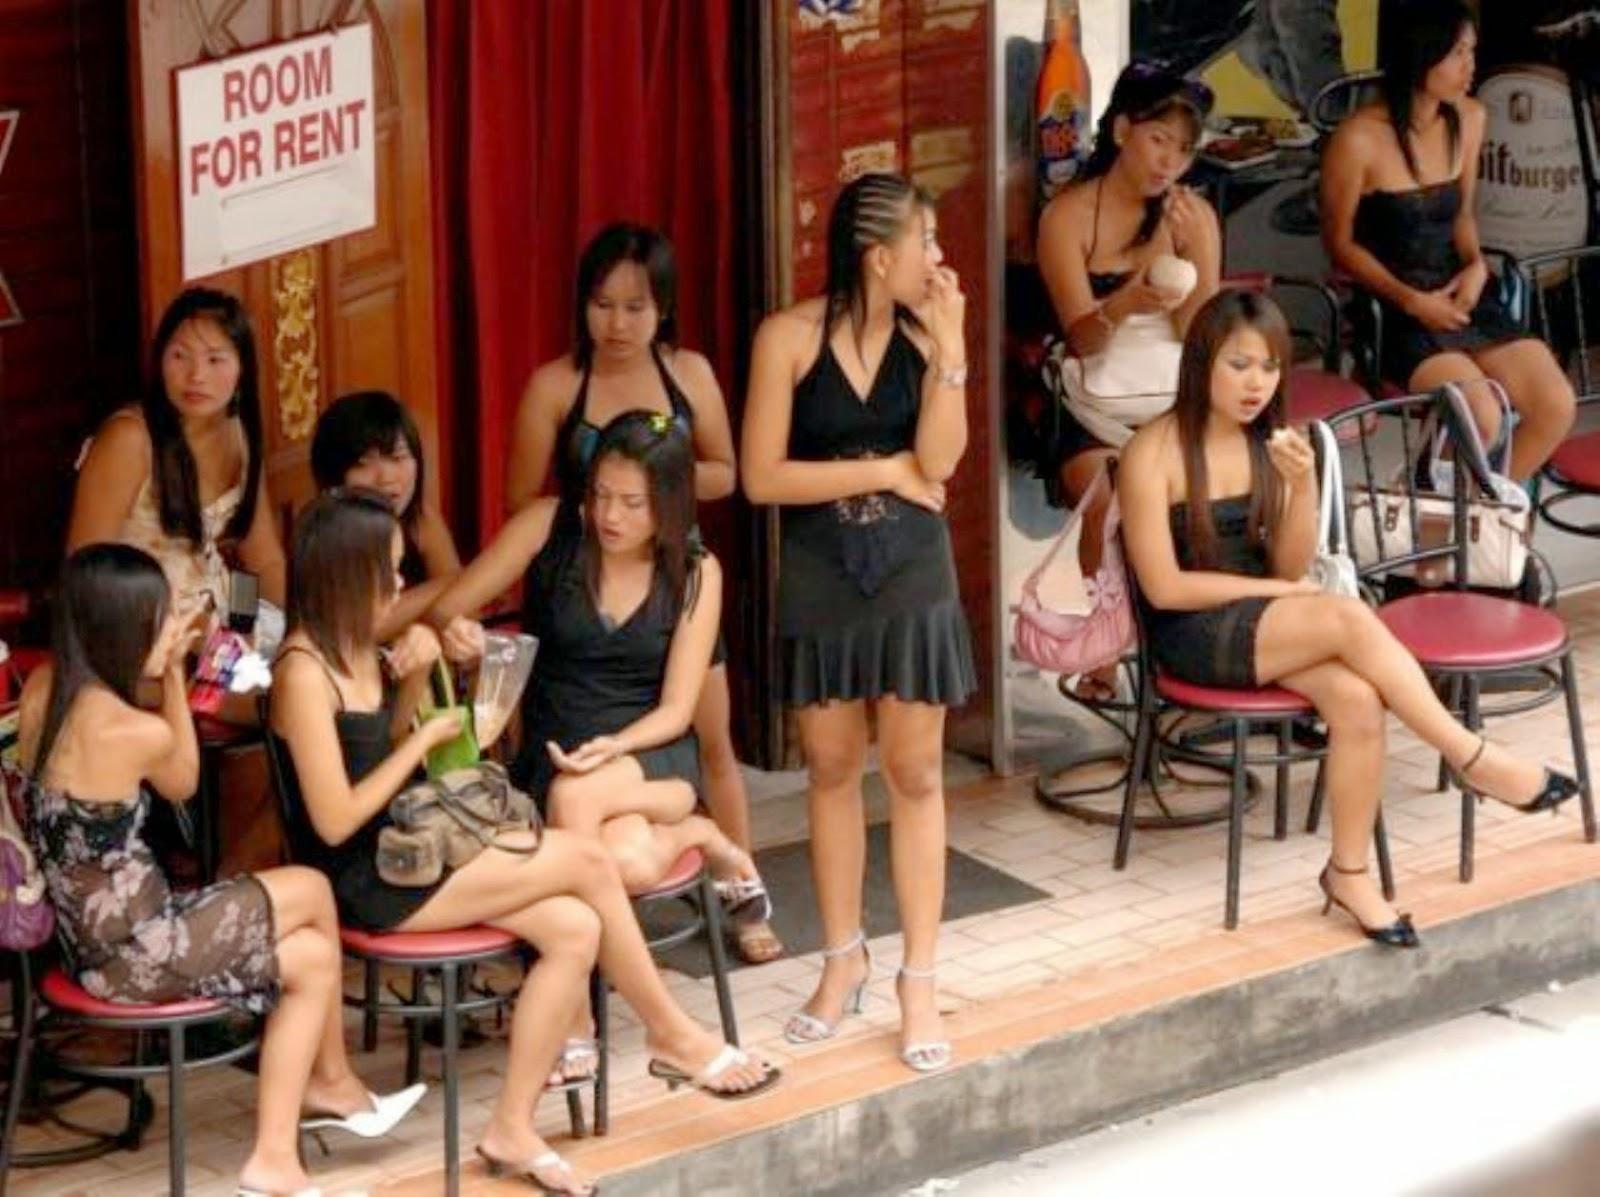 prostitutas asiaticas en españa prostitutas en club